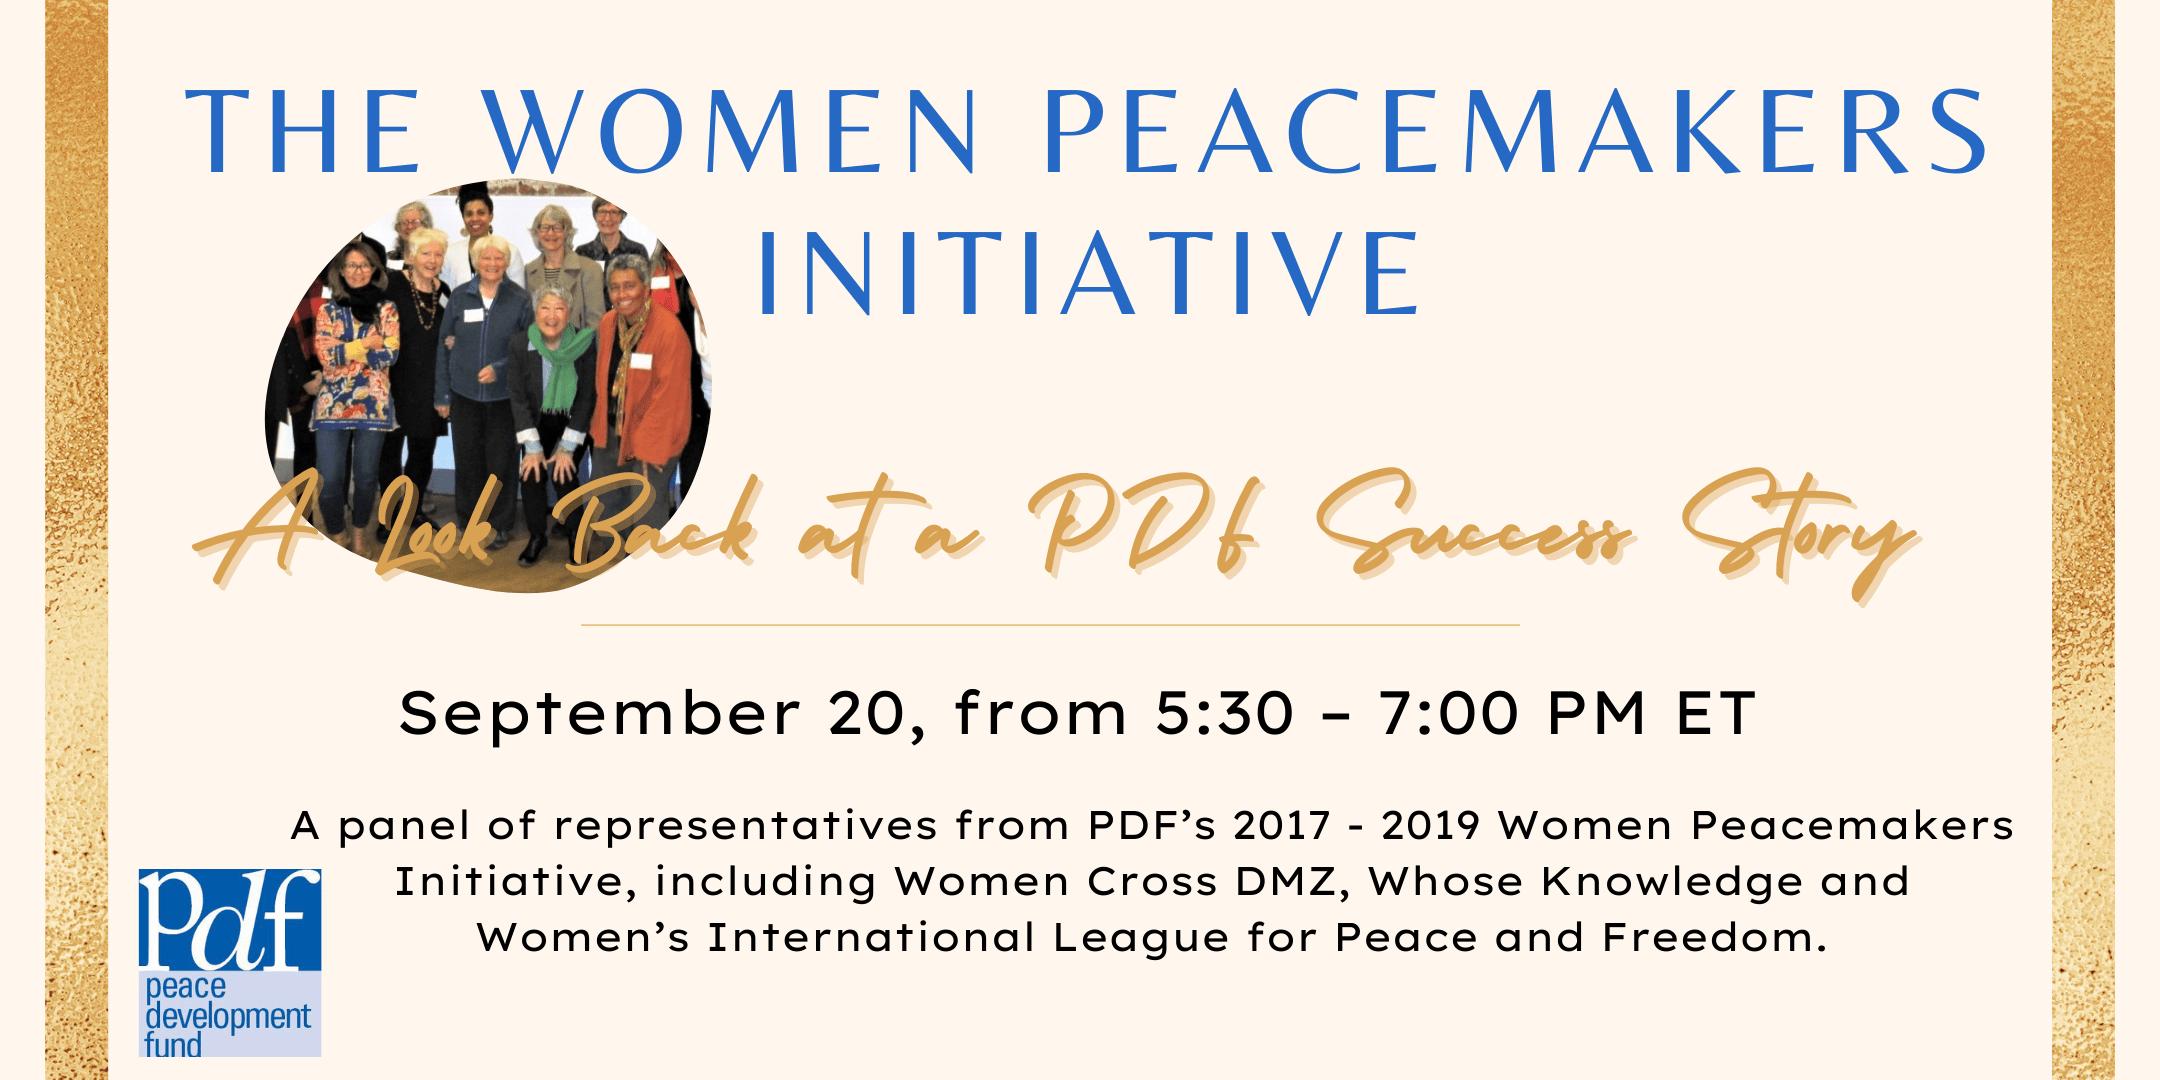 women peacemakers initiative